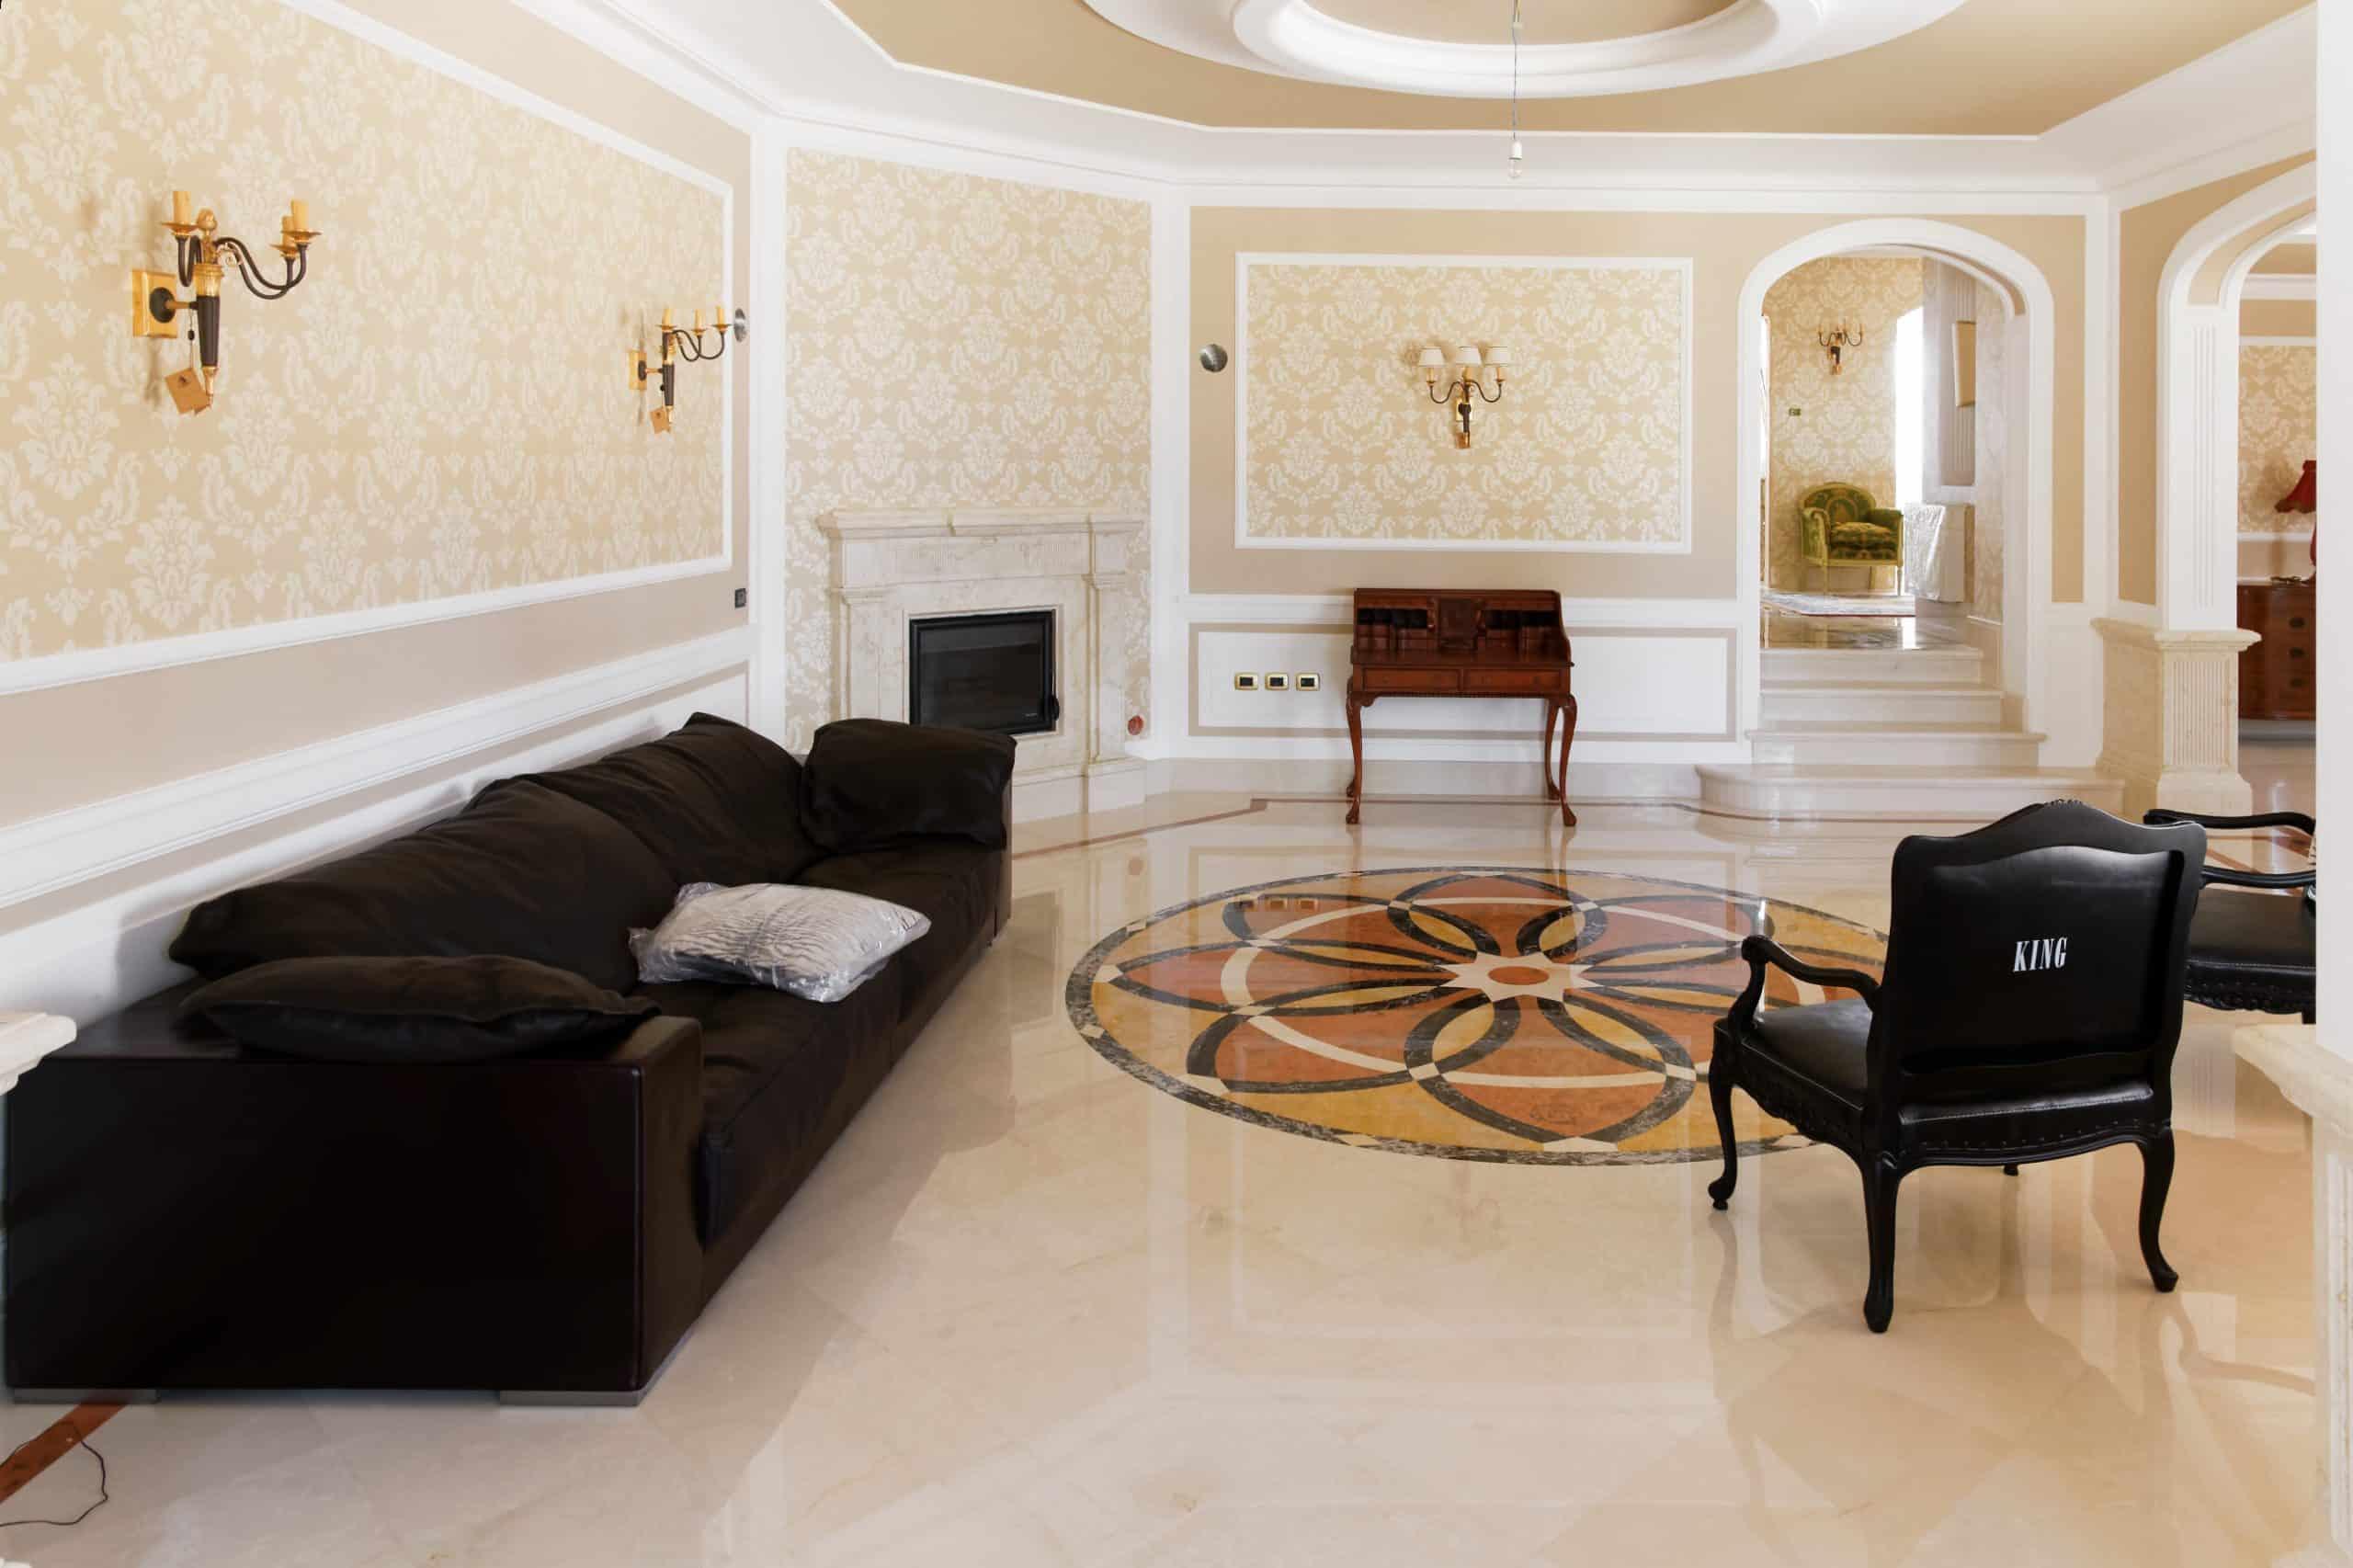 villa pavimento marmo intarsio carpet avorio 4 scaled